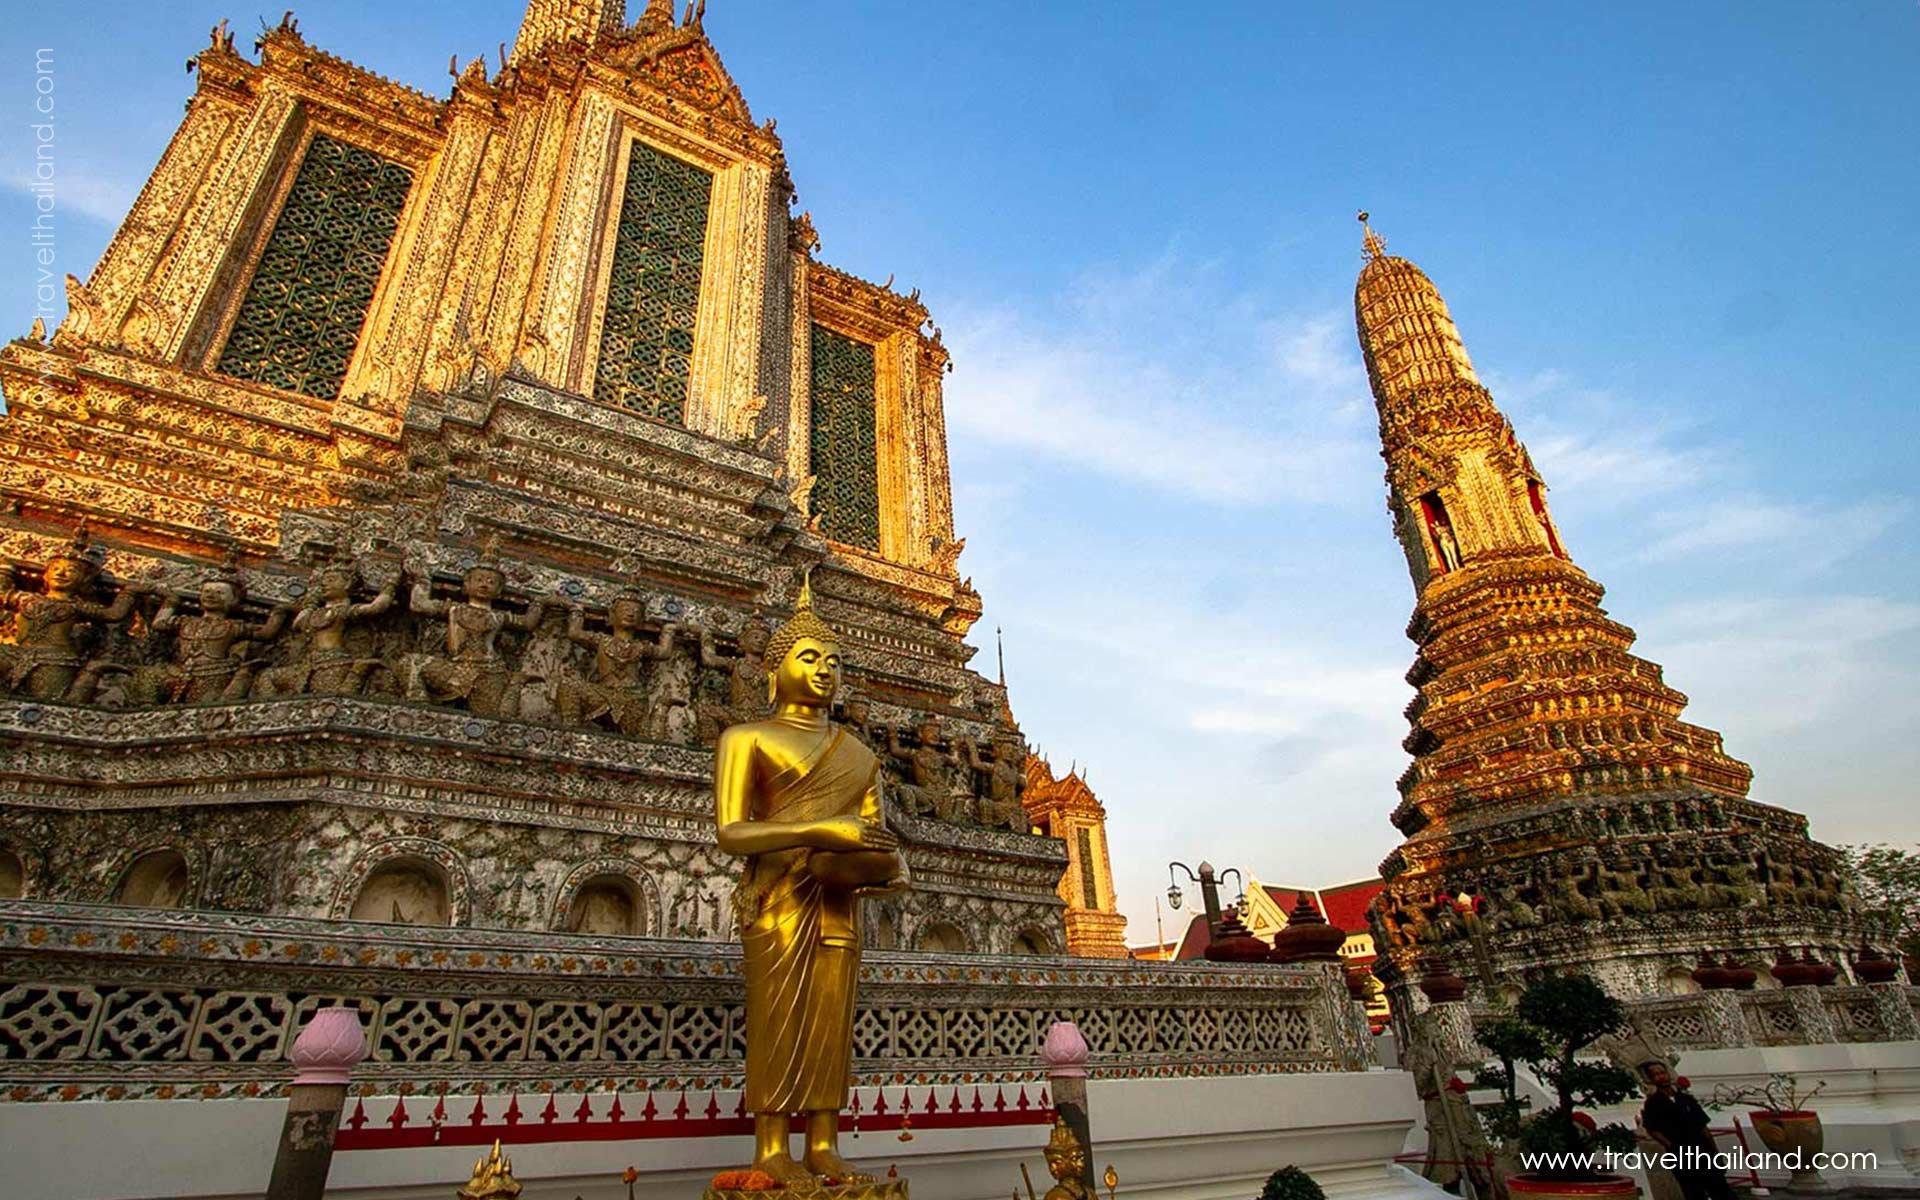 Authentic Thailand & Myanmar - 10 Days